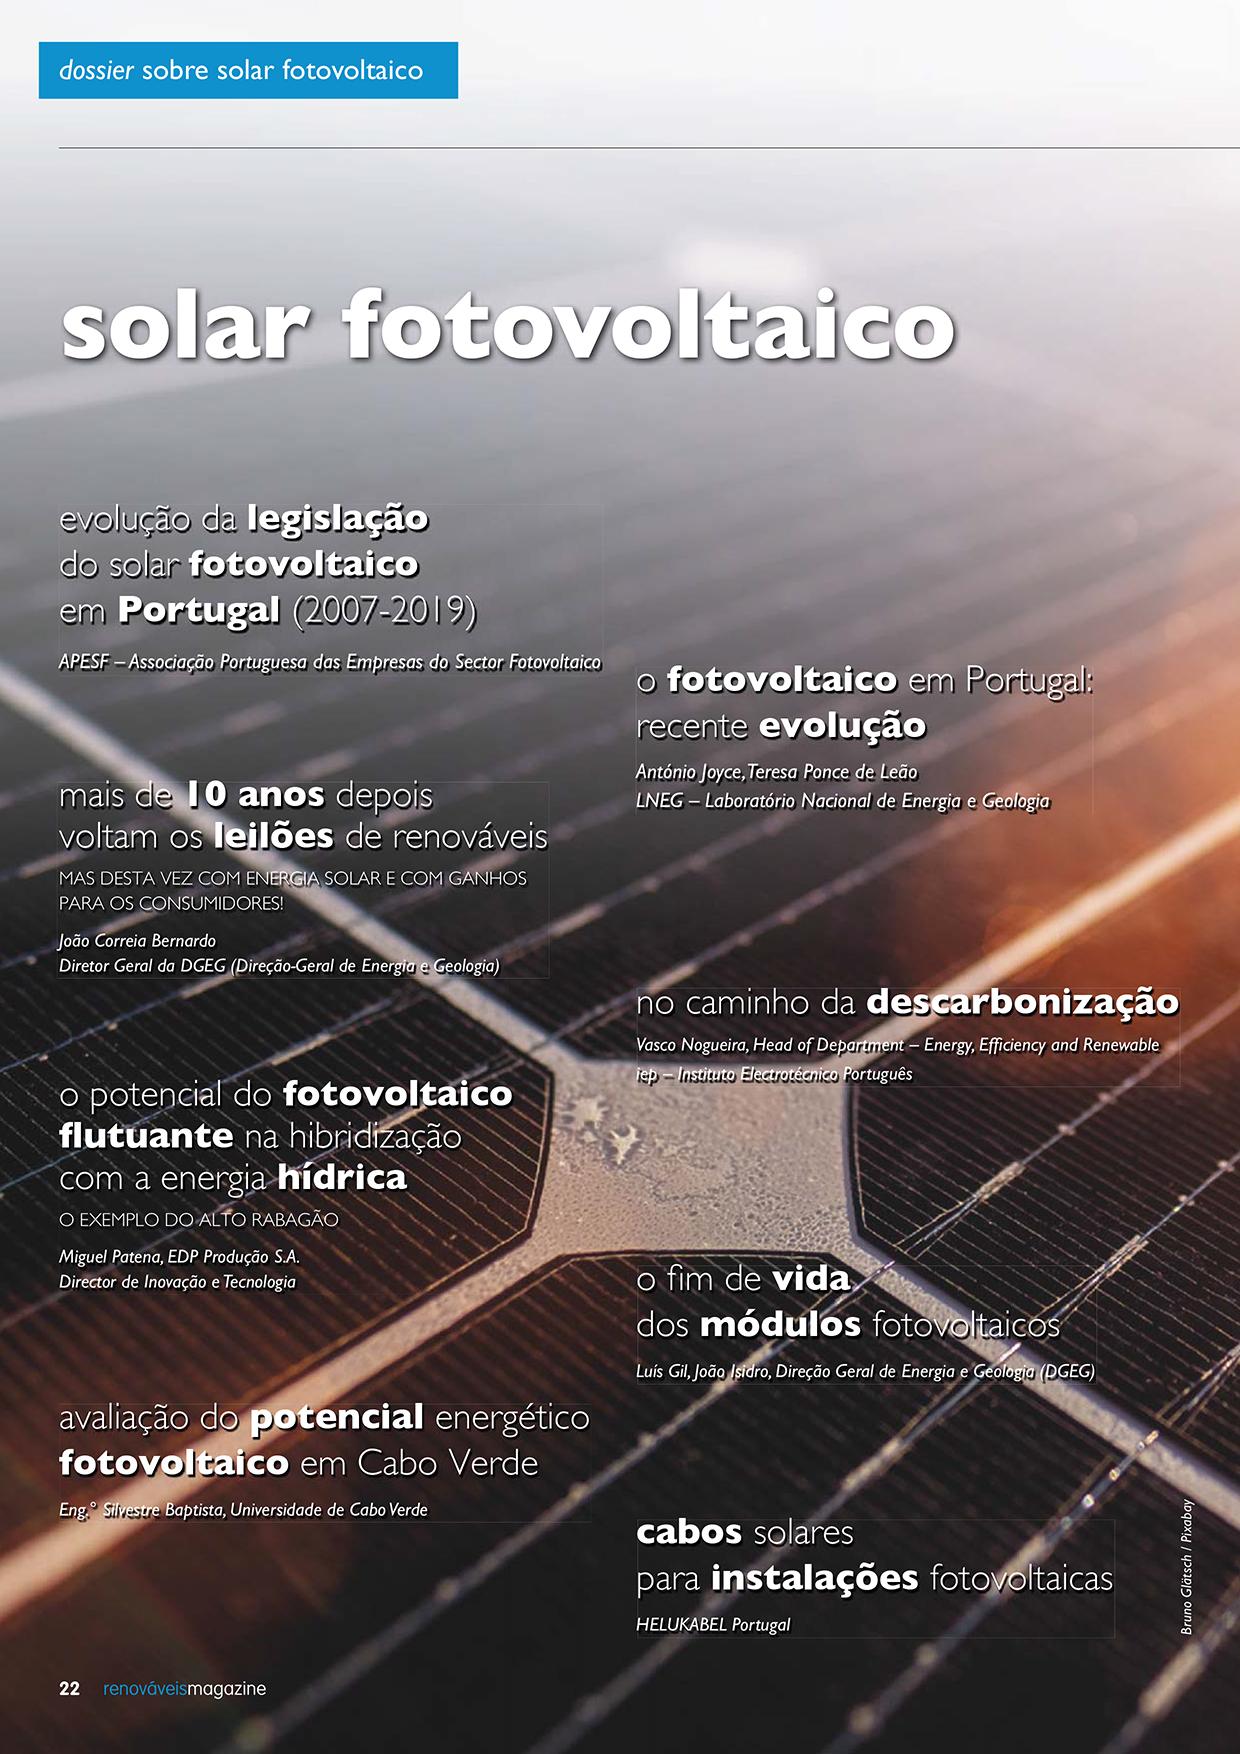 Dossier sobre solar fotovoltaico